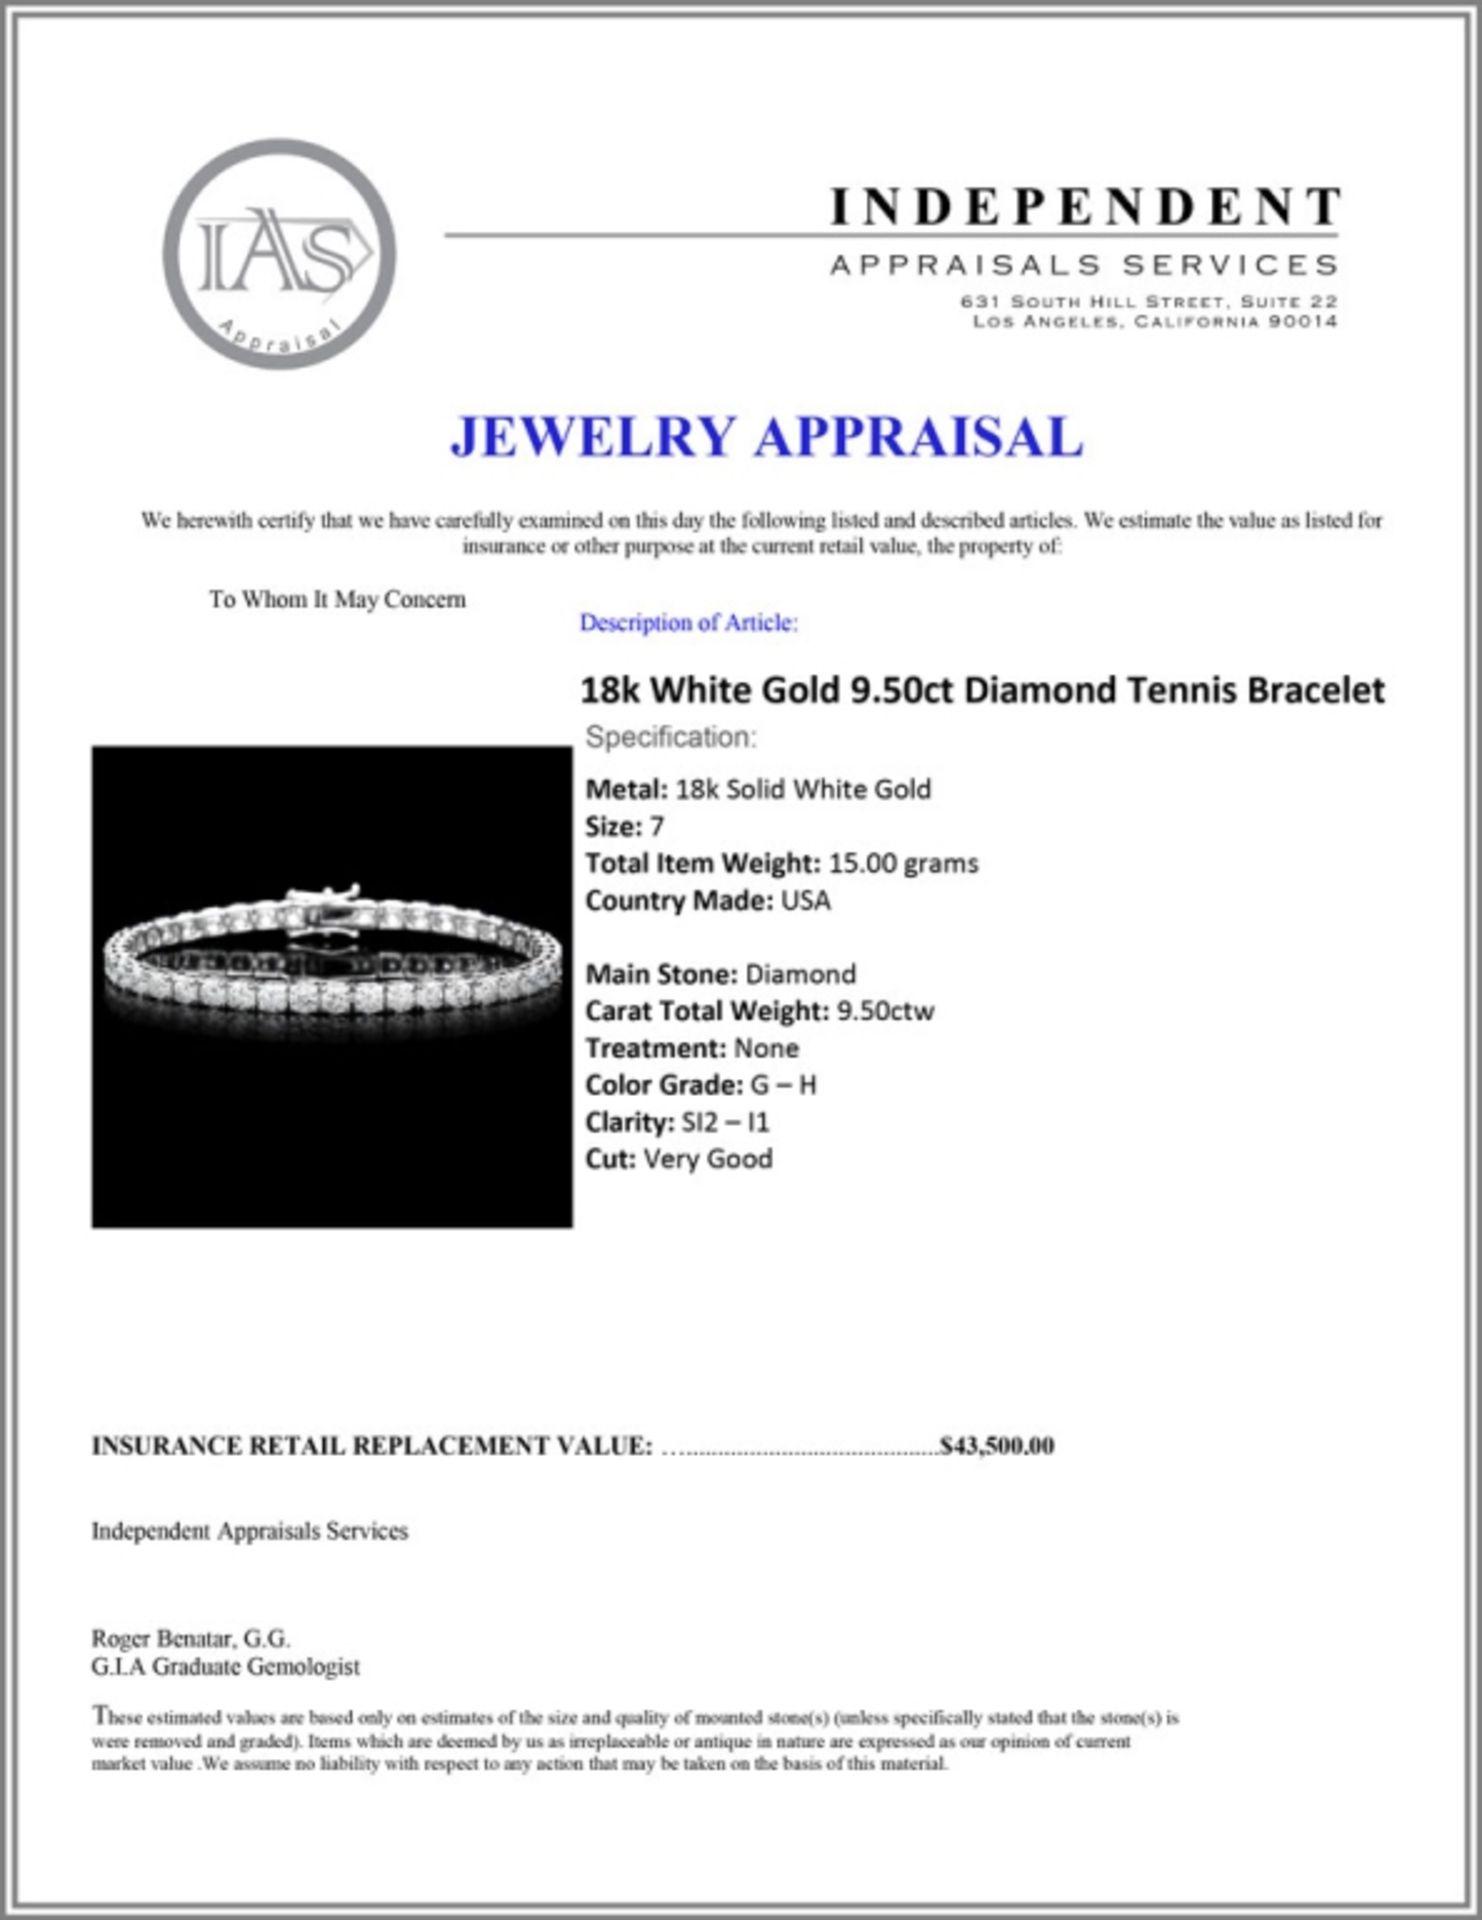 18k White Gold 9.50ct Diamond Tennis Bracelet - Image 4 of 4